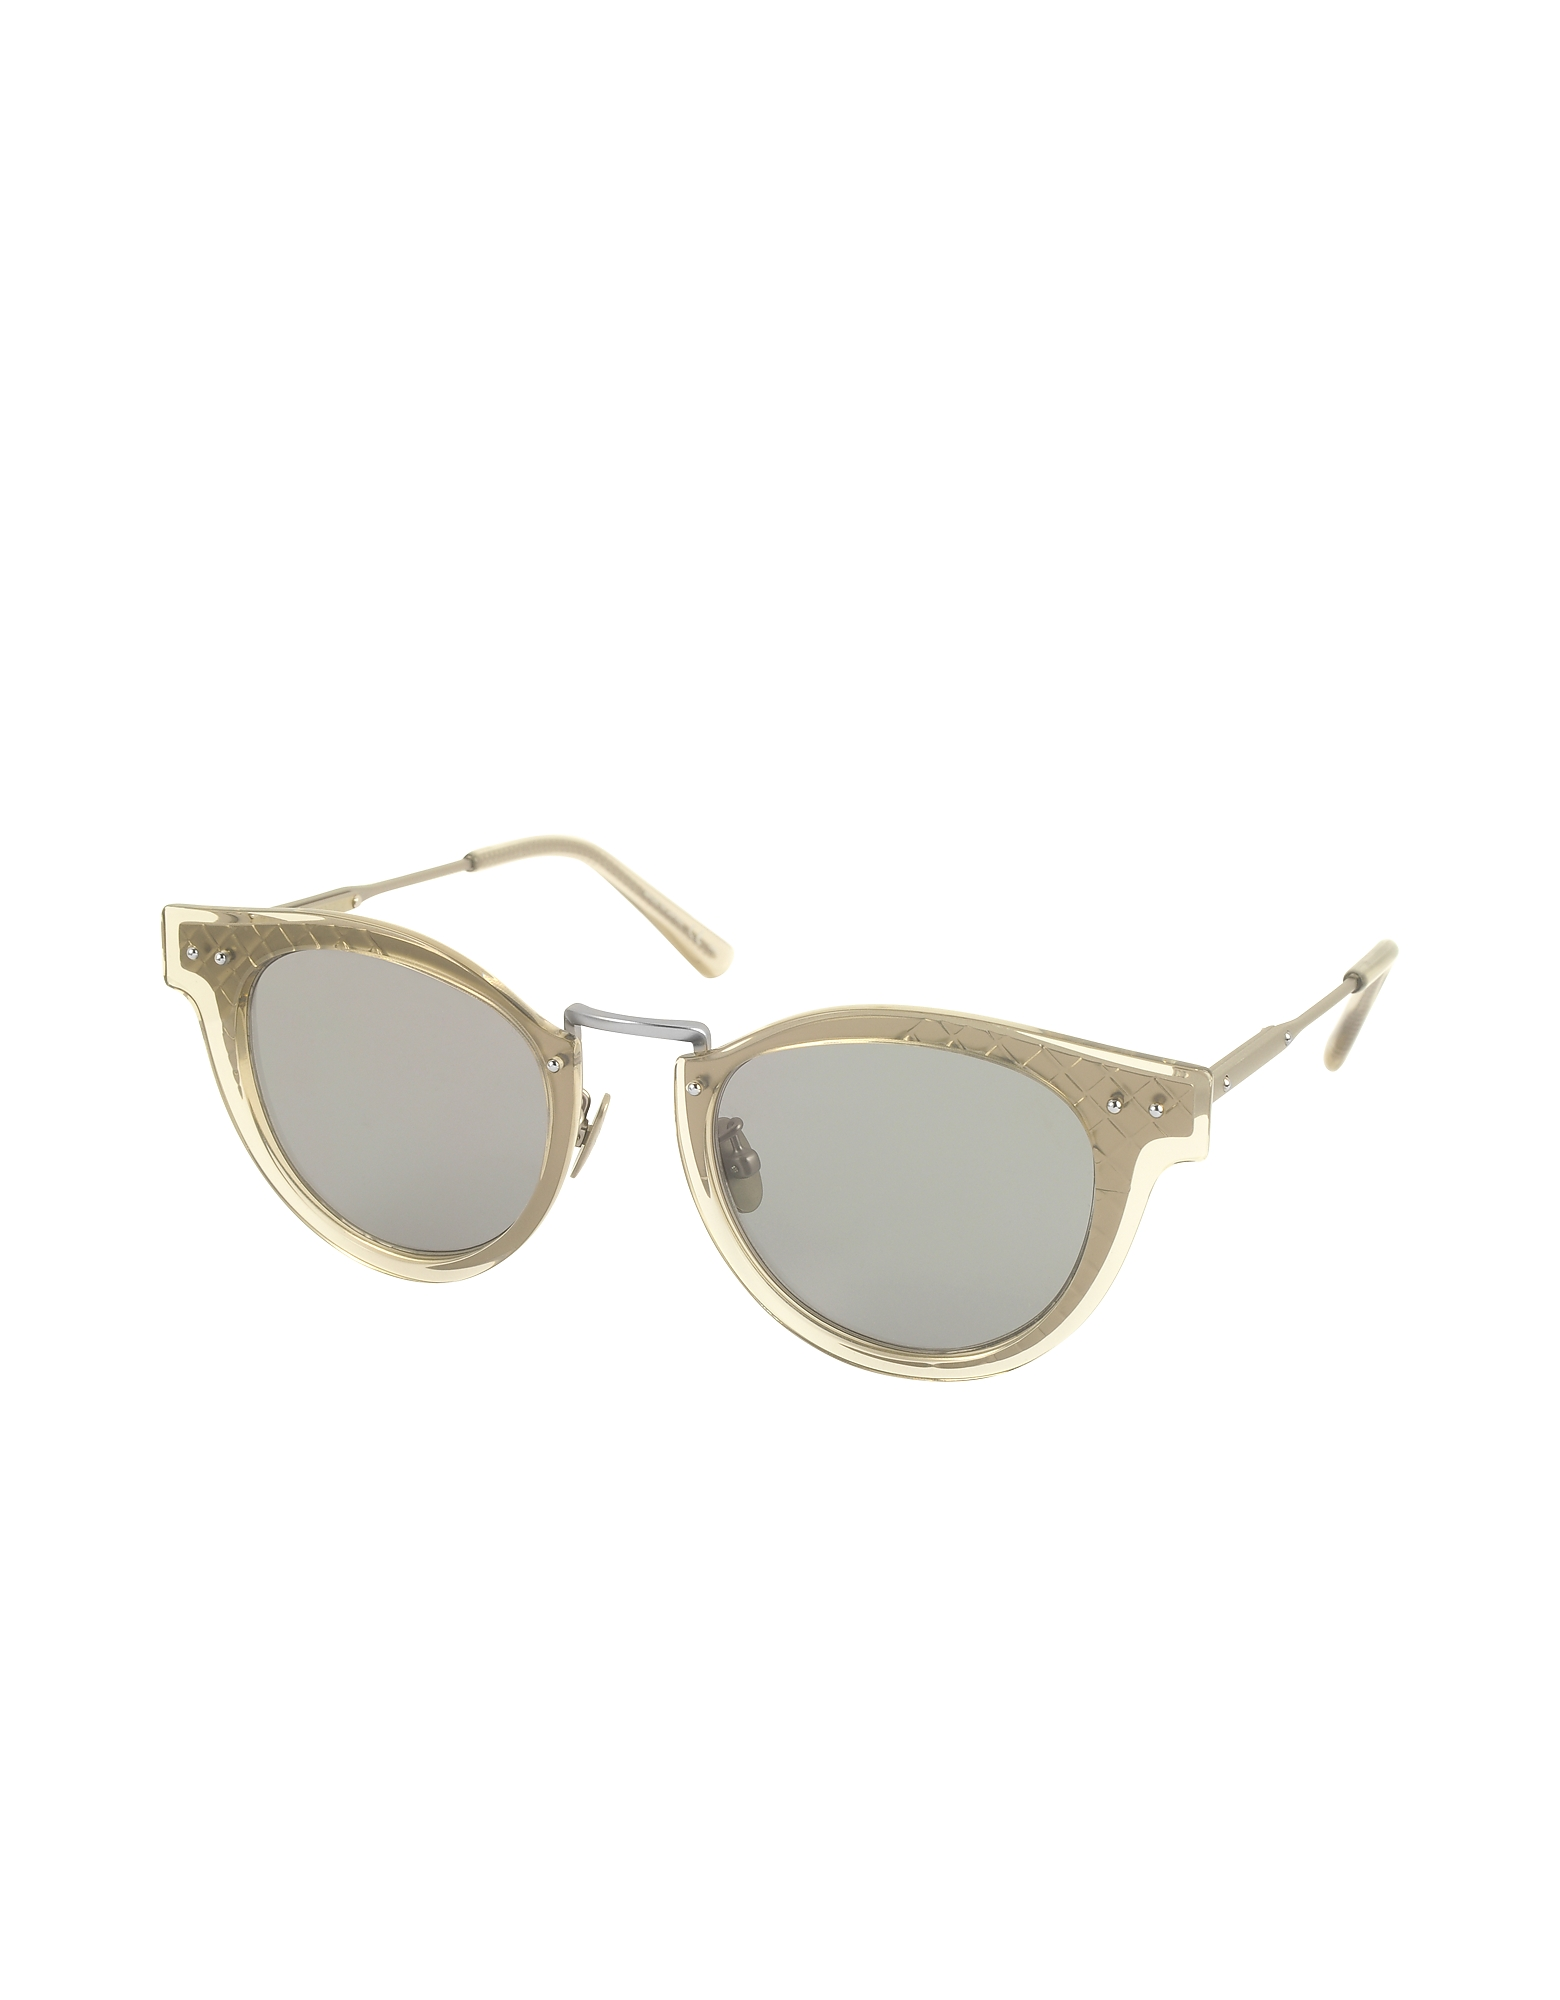 BV0117S 004 Ruthenium Metal Frame Unisex Sunglasses от Forzieri.com INT